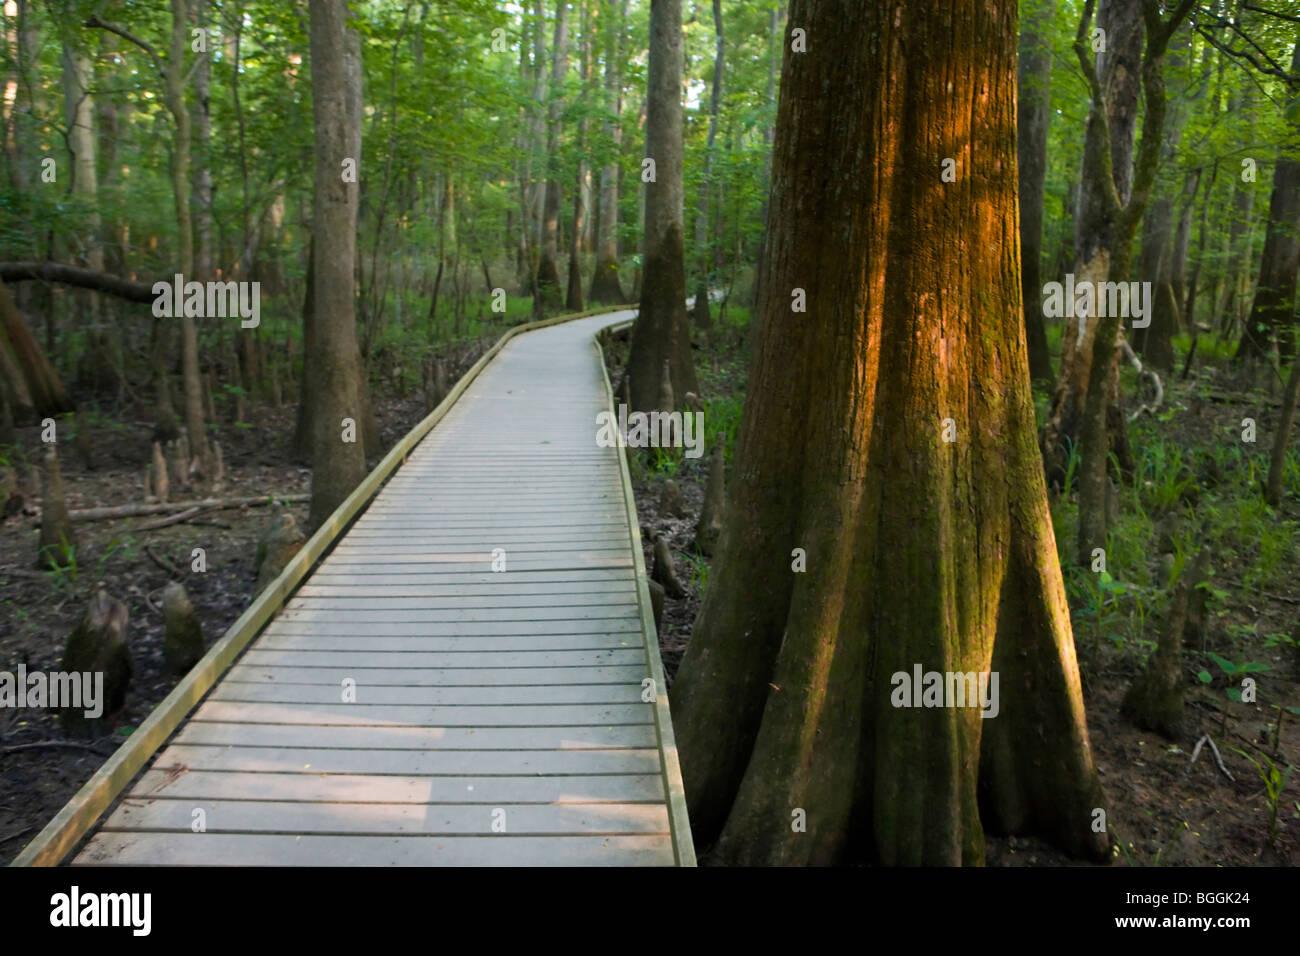 Boardwalk path next to illuminated tree in forest, Congaree National Park, near Columbia, South Carolina. - Stock Image